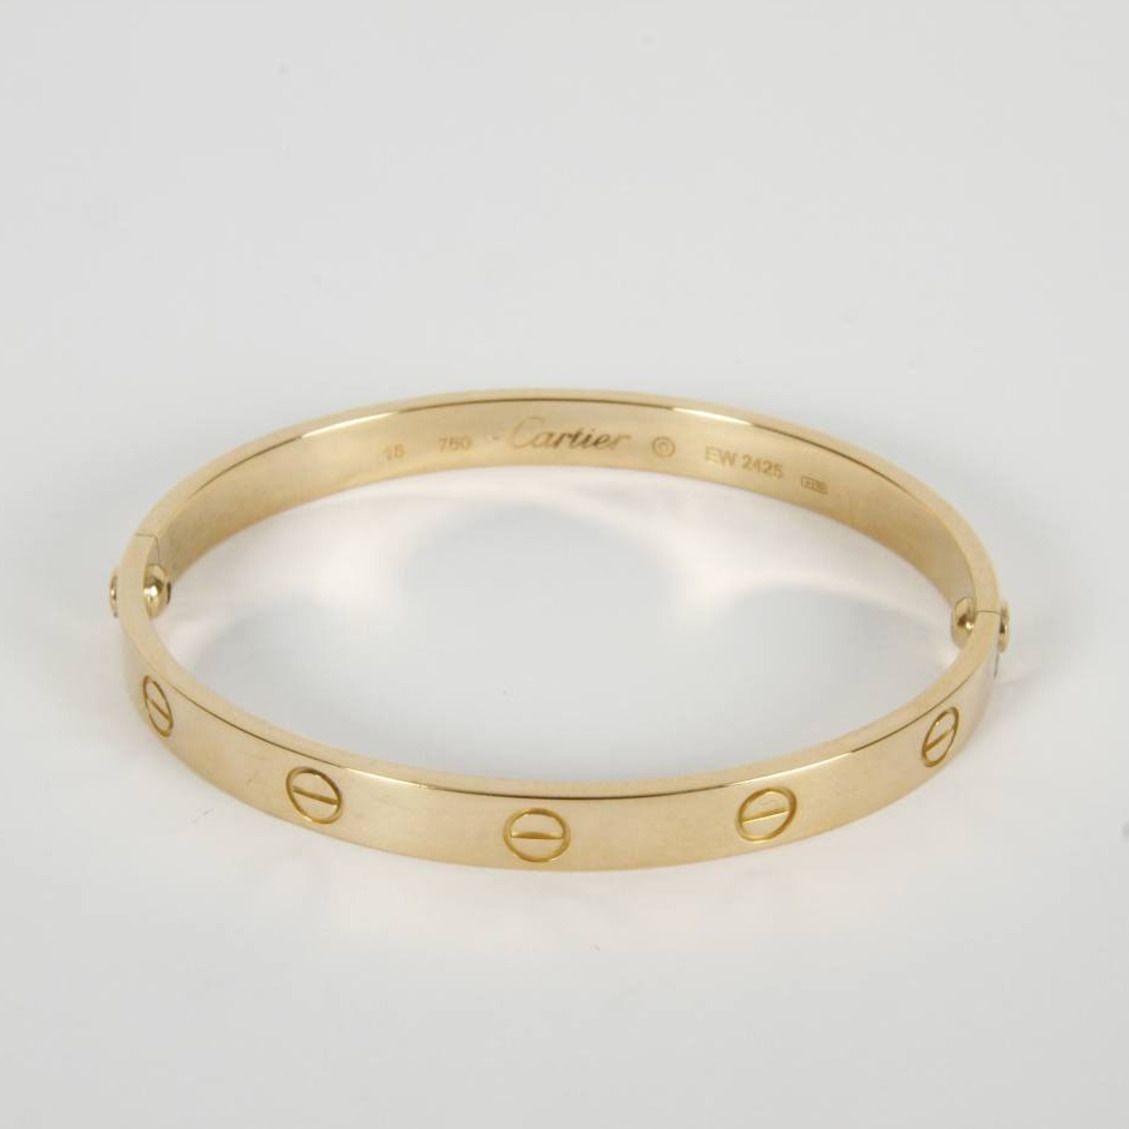 83add67f9cde Brazalete CARTIER Love de oro de 18 quilates. Diámetro: 58,50 mm ...